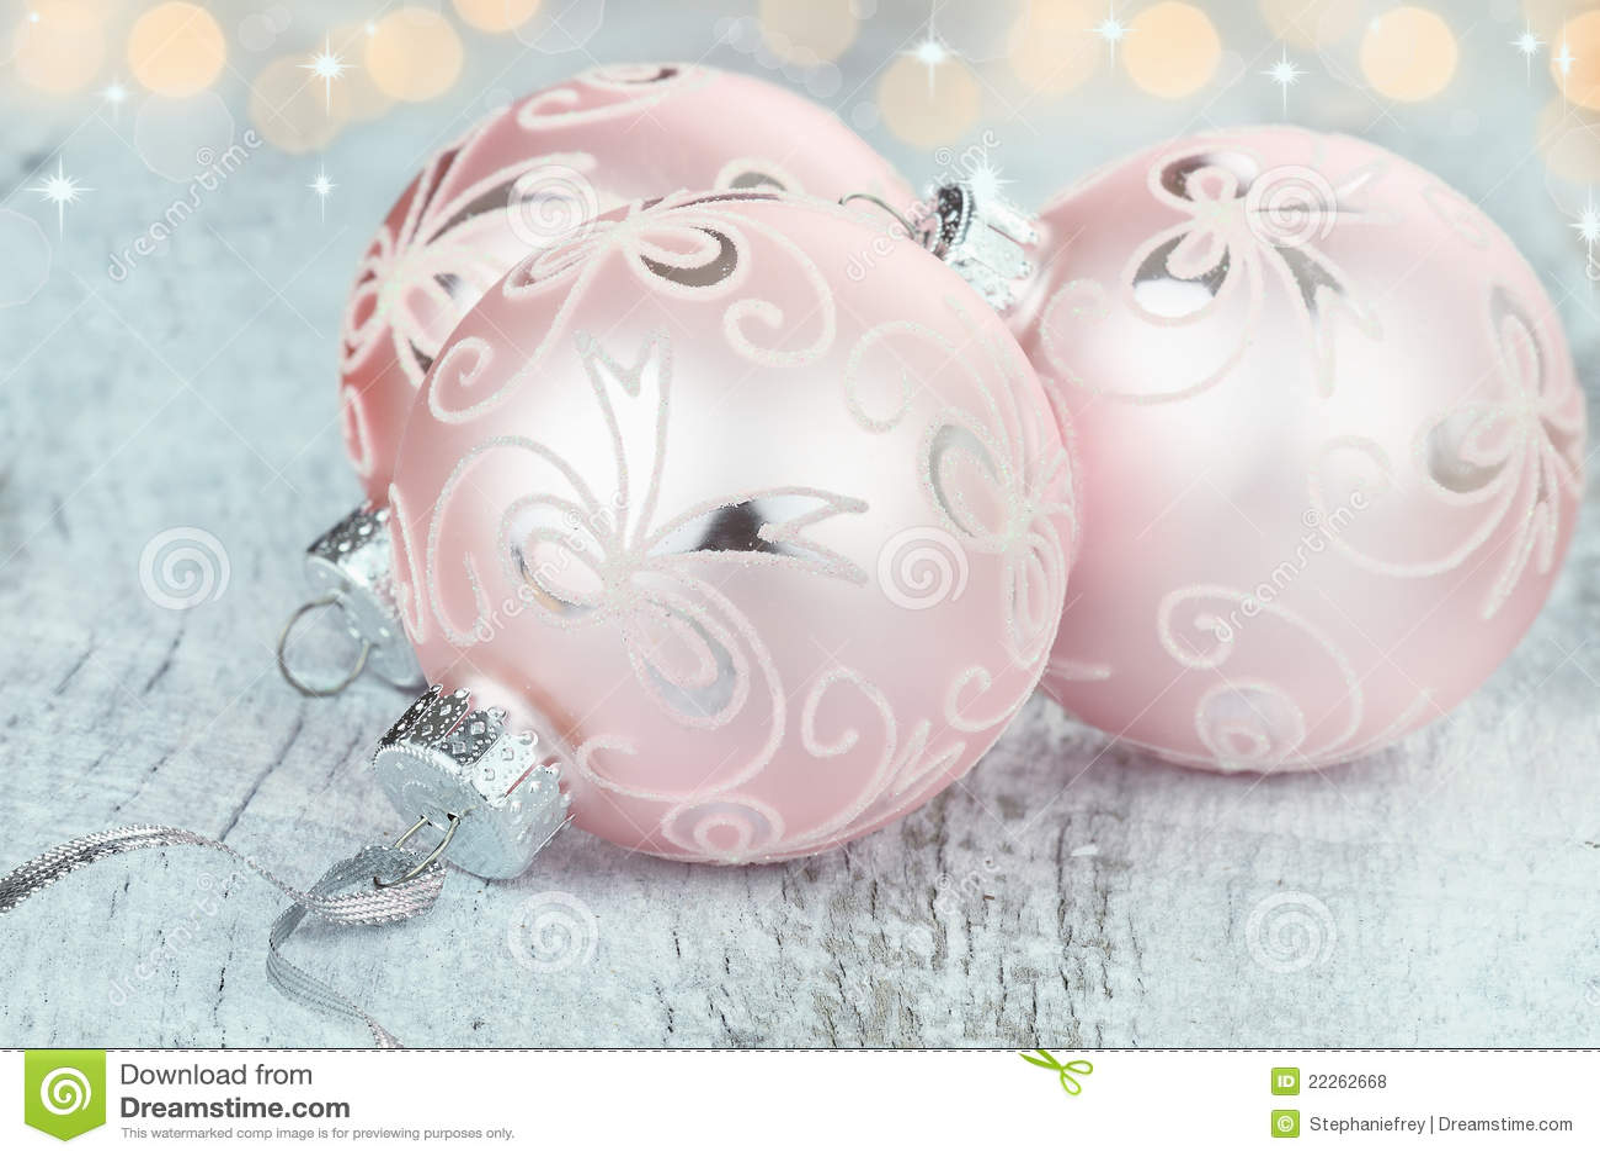 Pink Christmas Ornaments Royalty Free Stock Photos Image